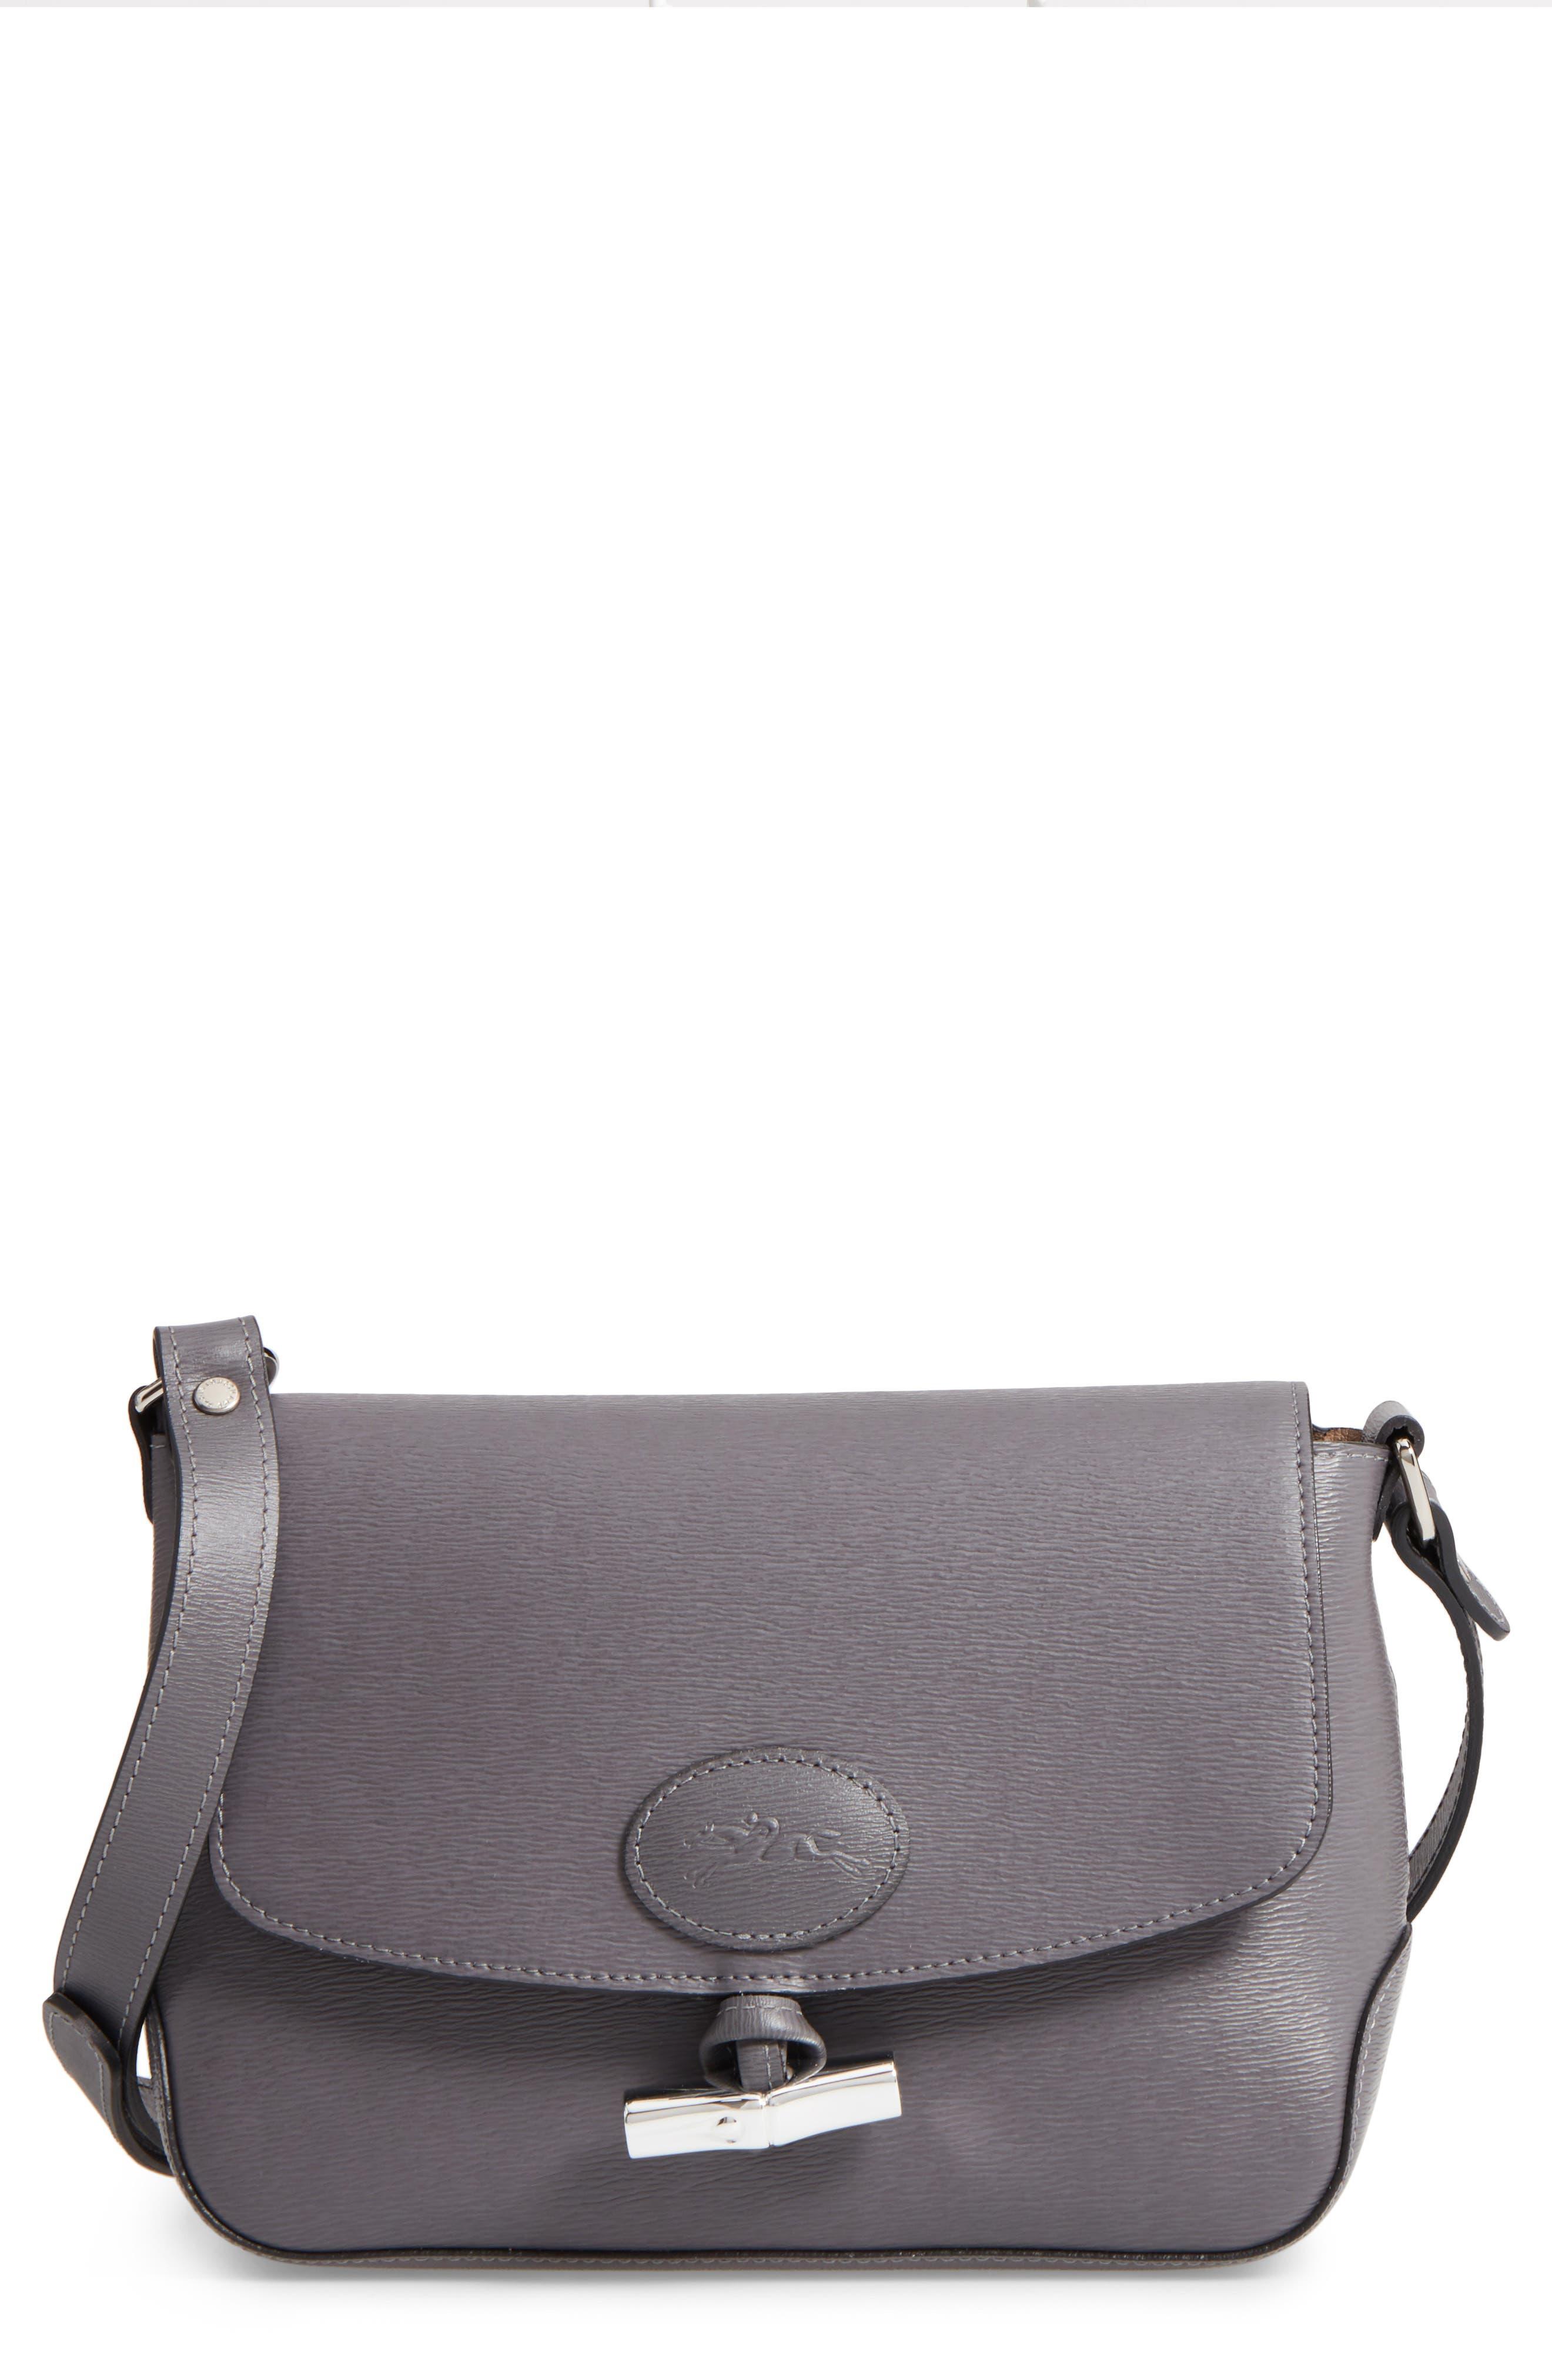 LONGCHAMP Roseau Leather Crossbody Bag